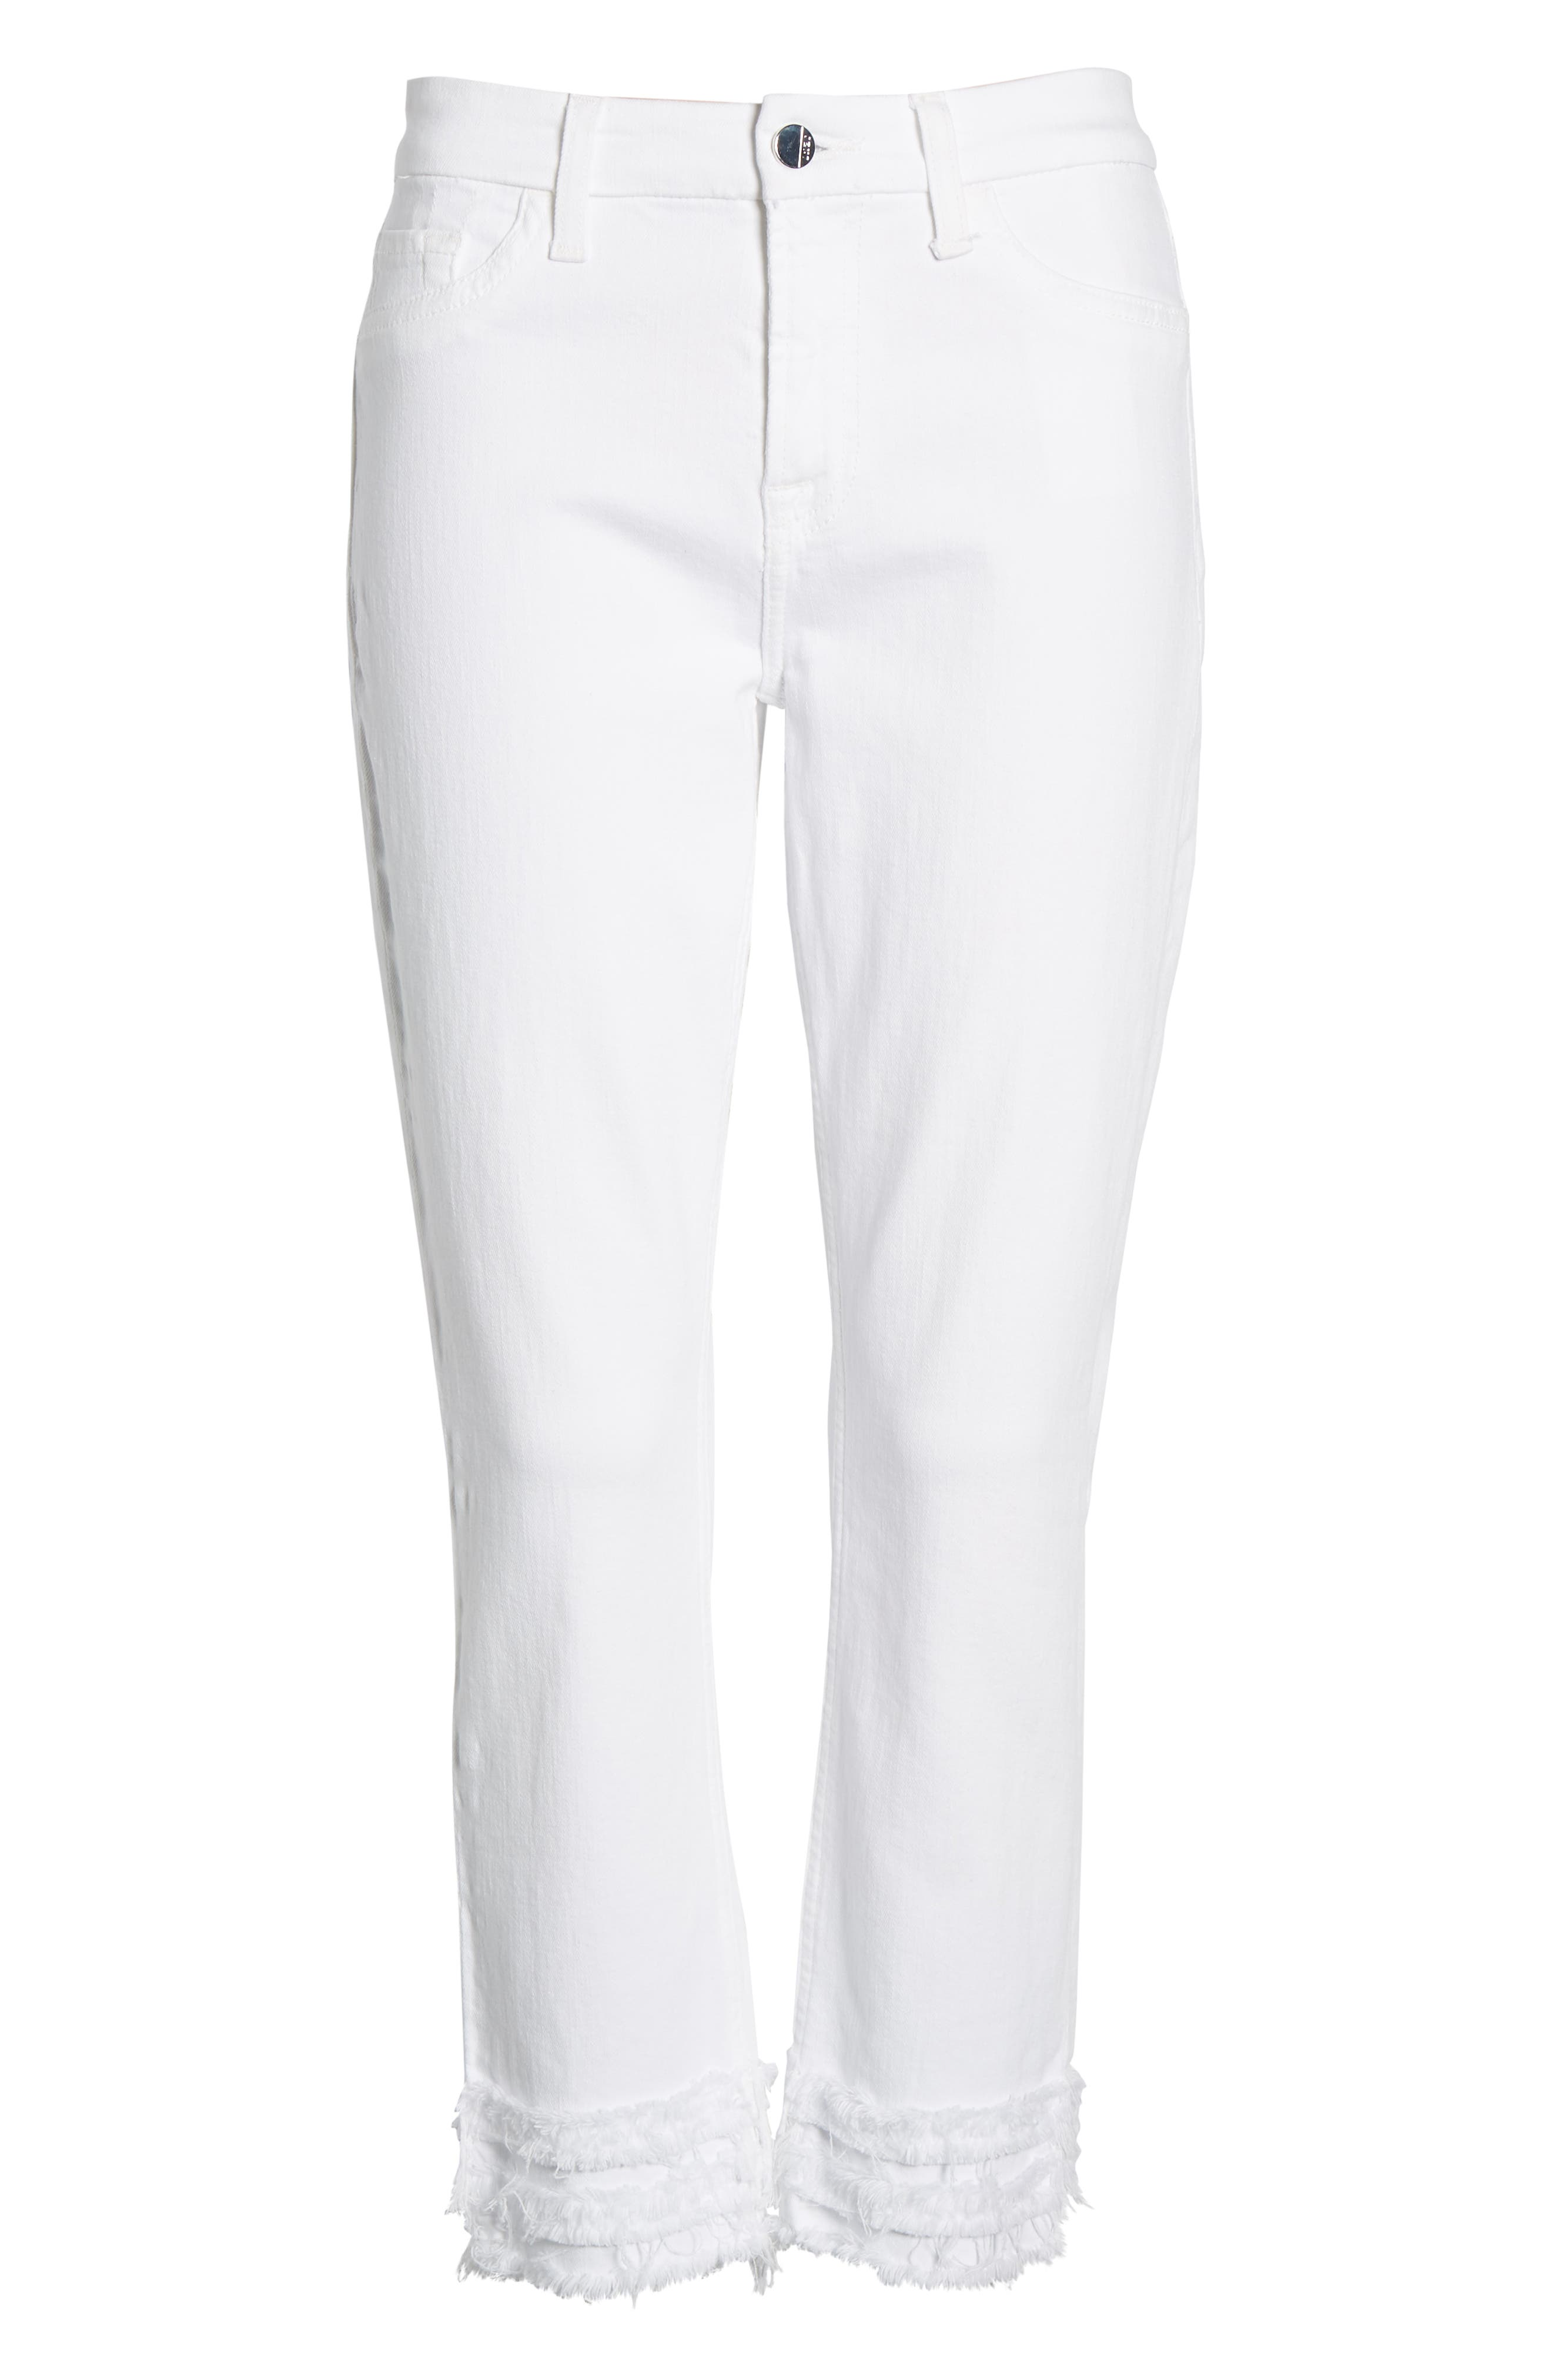 JEN7 BY 7 FOR ALL MANKIND, Fringe Hem Crop Jeans, Alternate thumbnail 7, color, WHITE FASHION